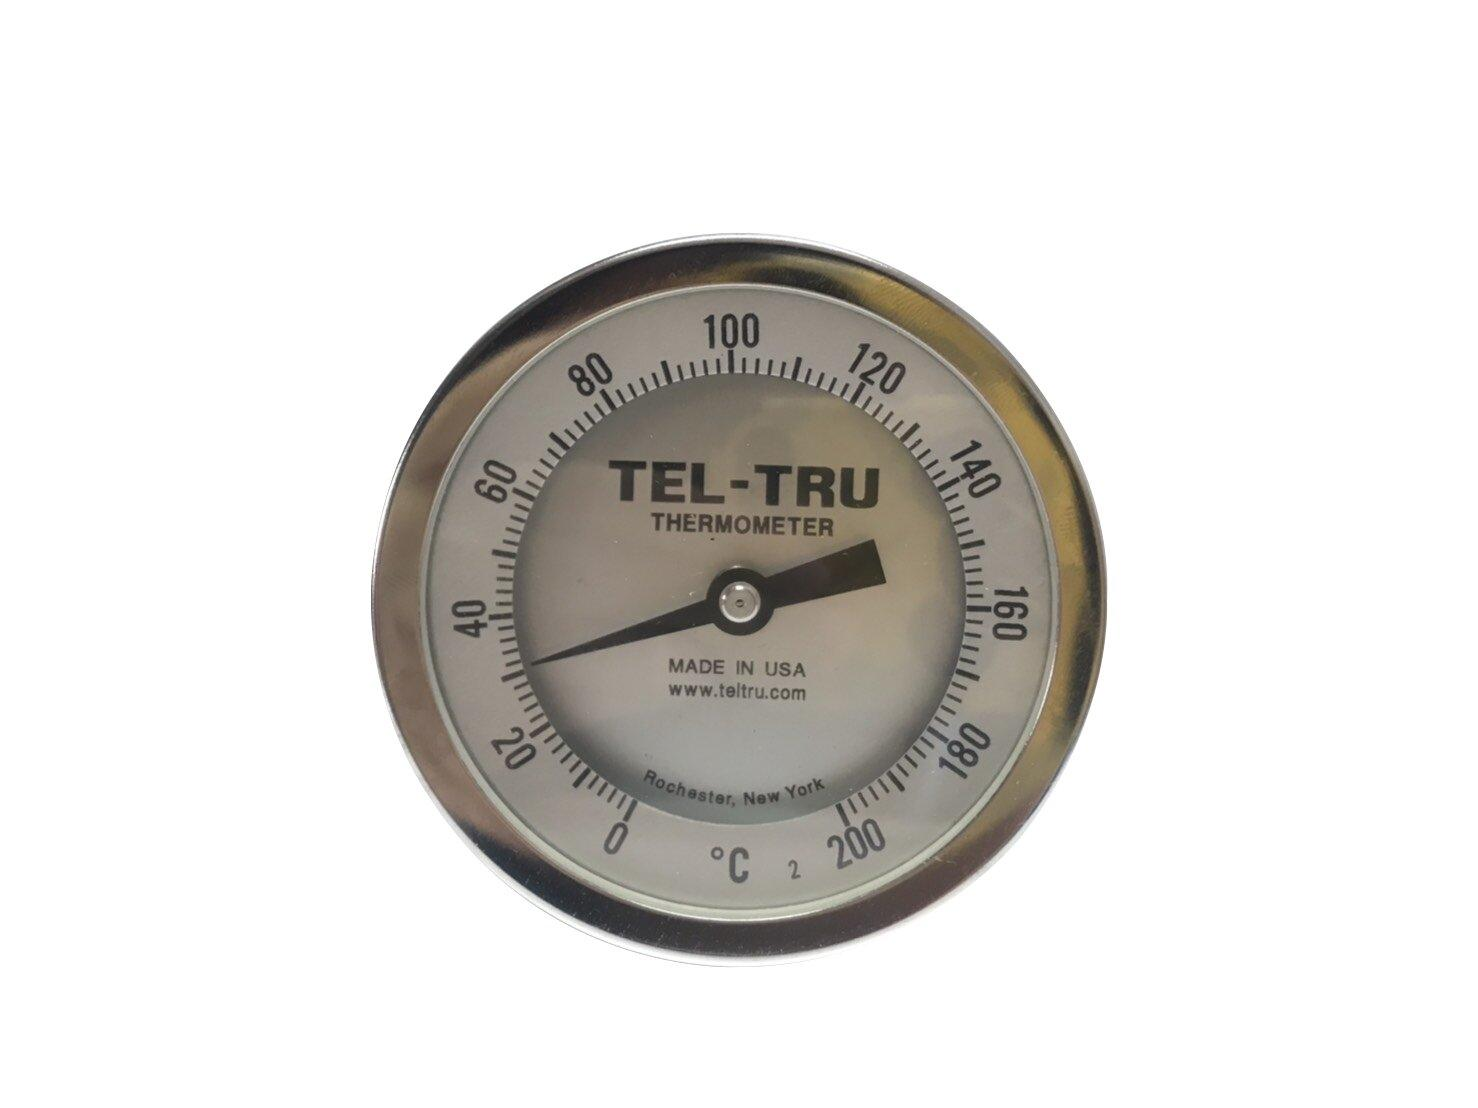 Tel-Tru Bimetal Thermometer รุ่น GT300R 3410-06-78